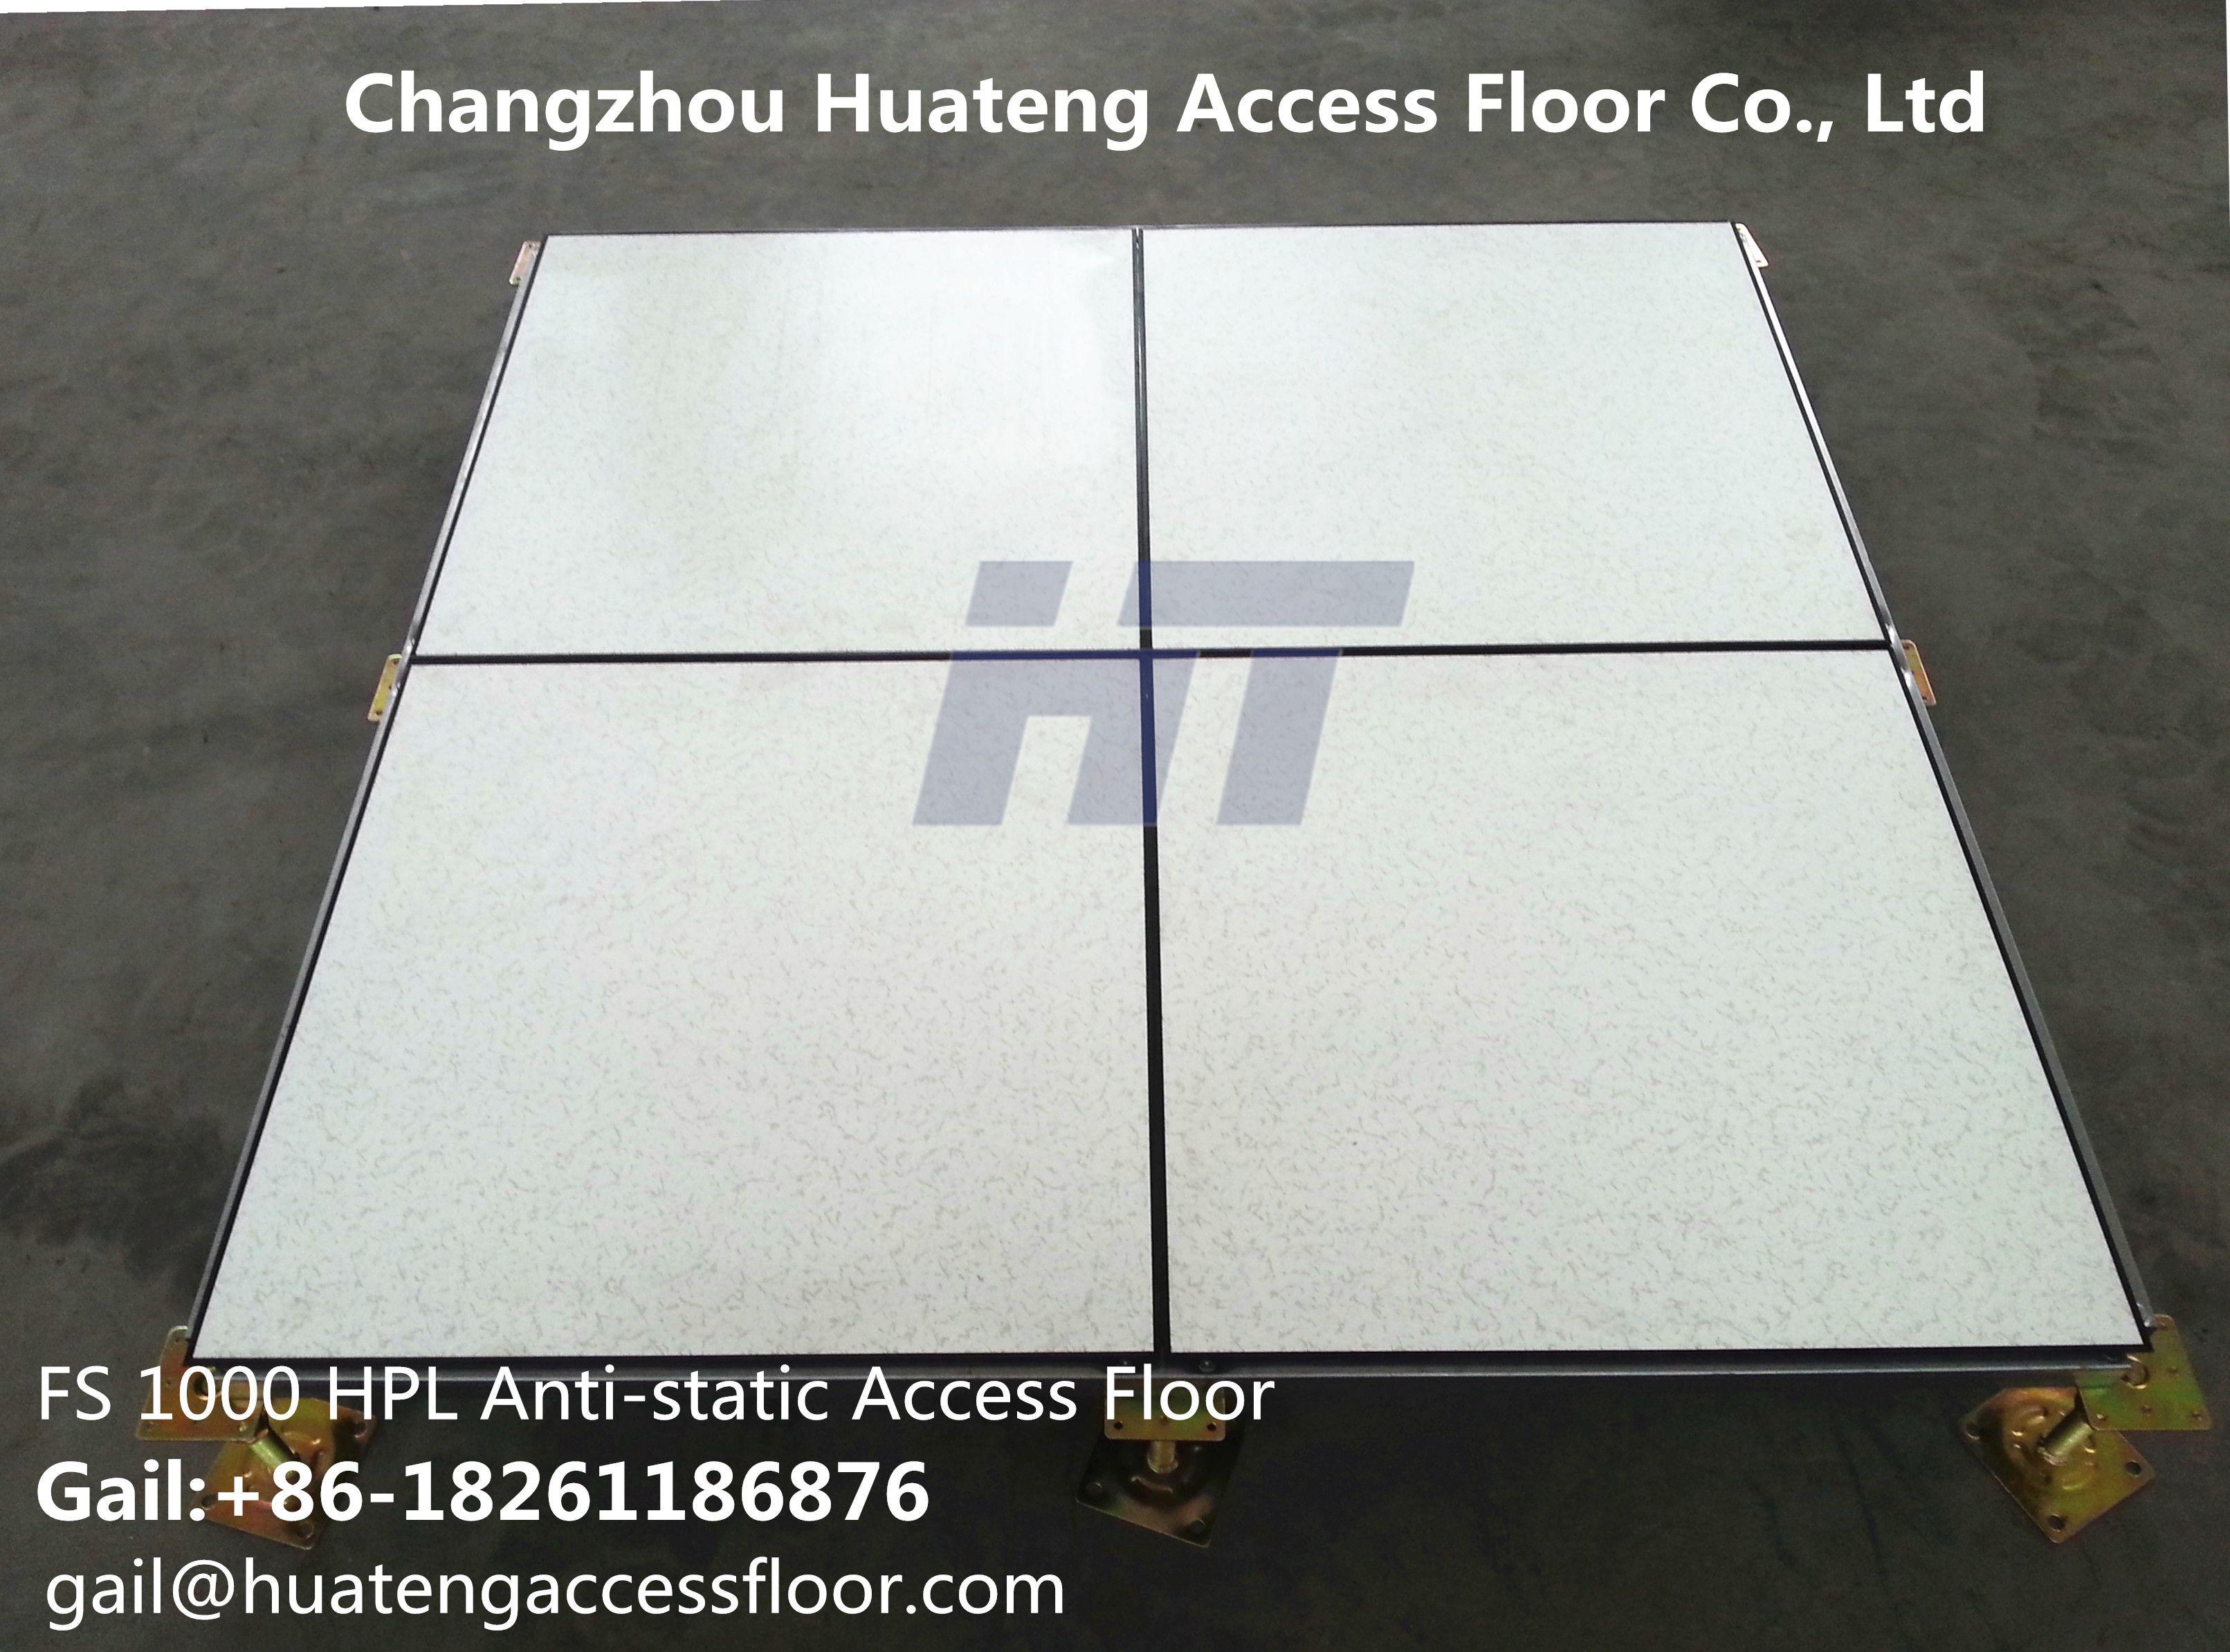 Ht Hpl Anti Static Raised Floor With 1200mm Stringers 高架活動